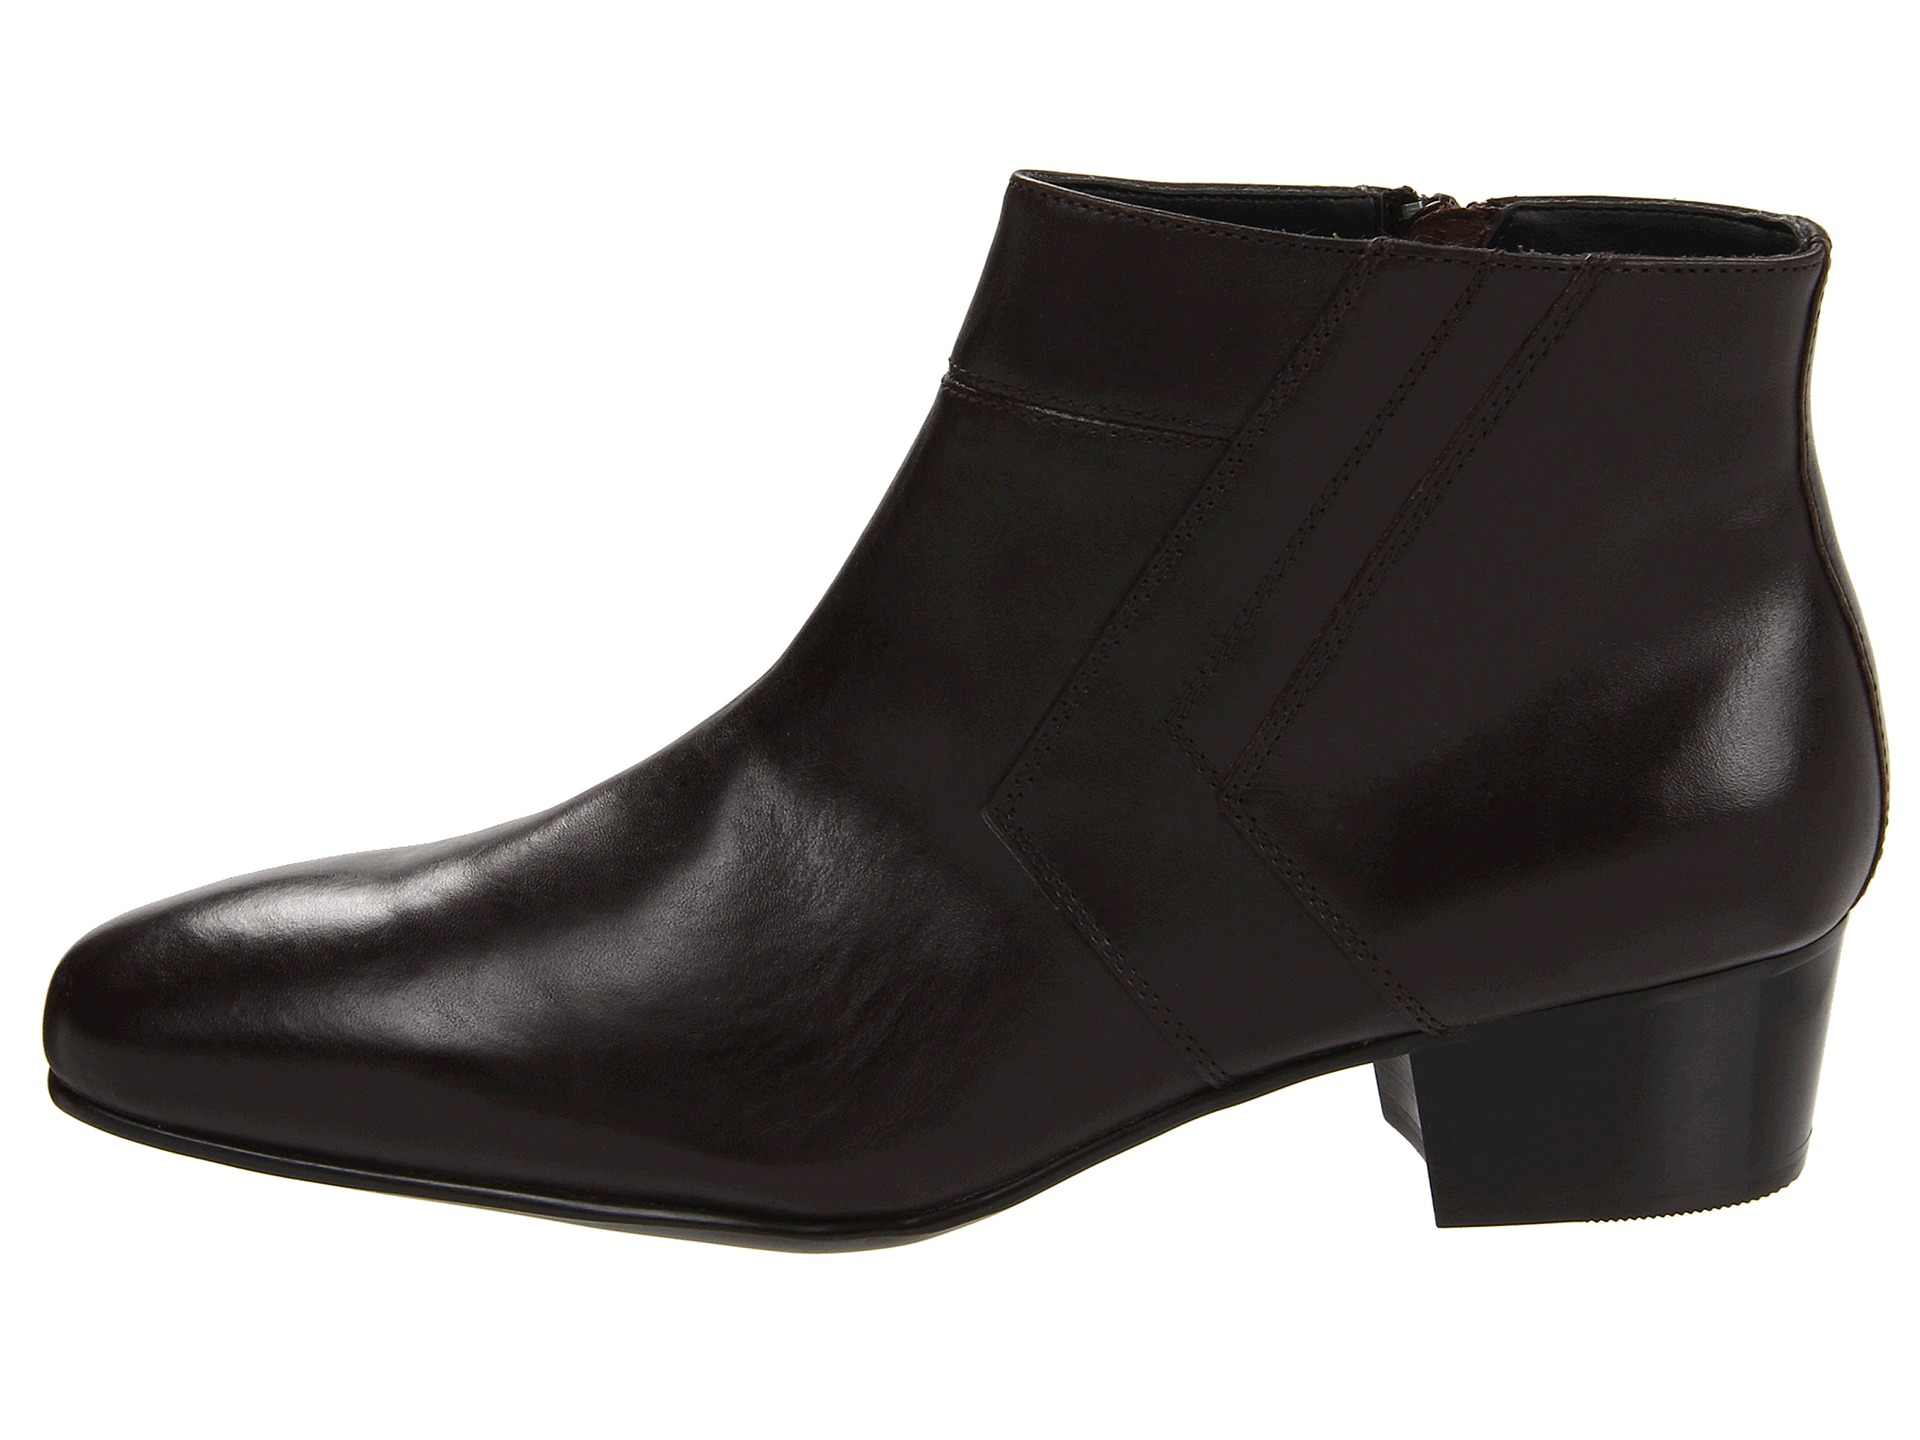 Blackjack star boots